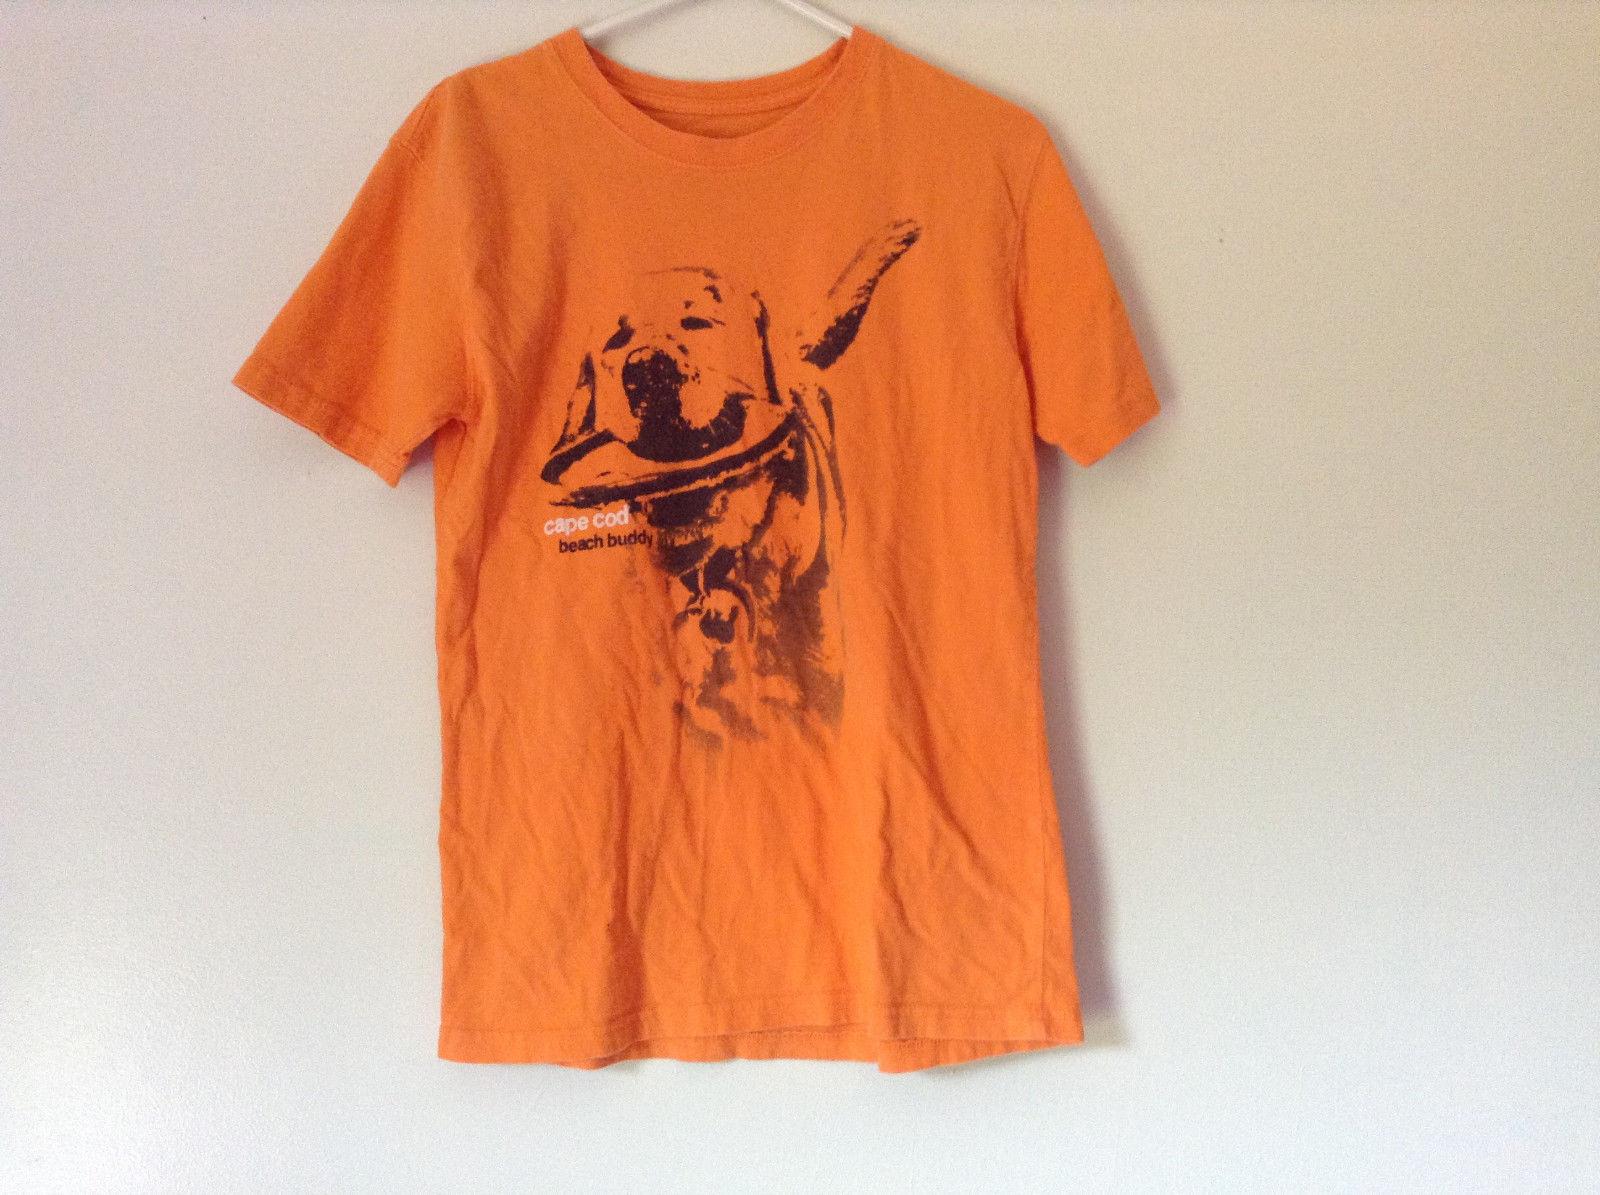 Orange Cuffys of Cape Code Beach Buddy T Shirt Size XL 18 to 20